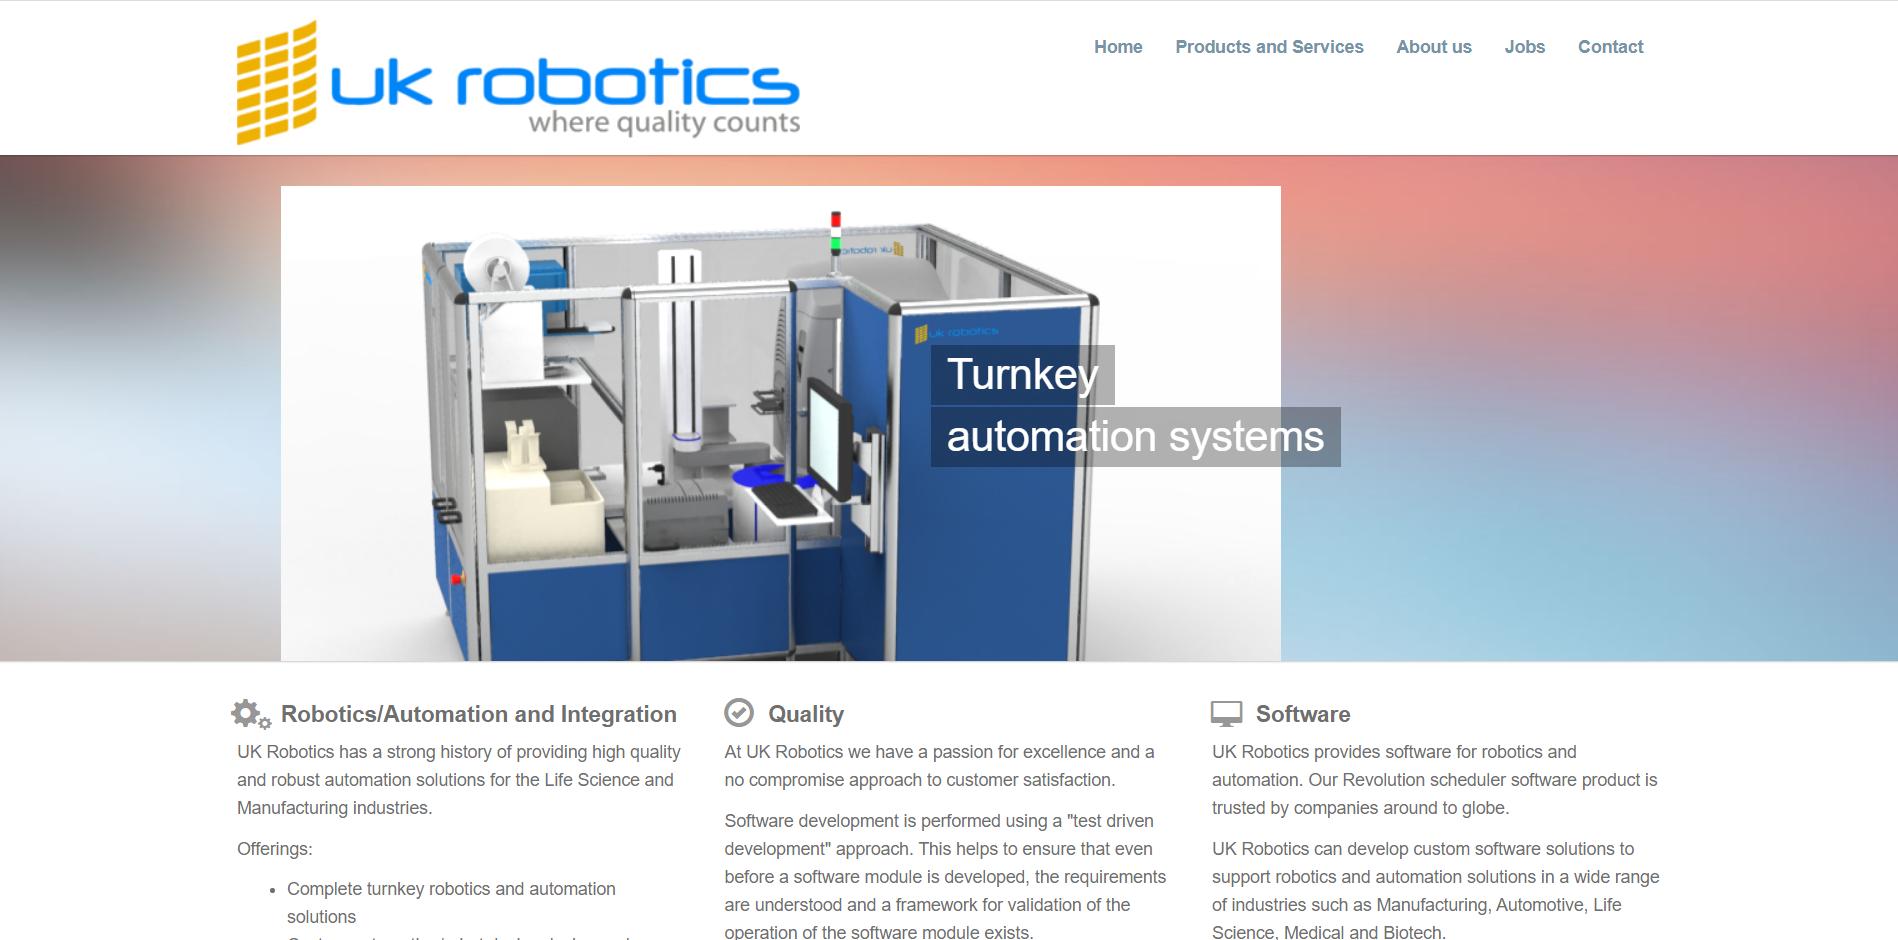 UK Robotics